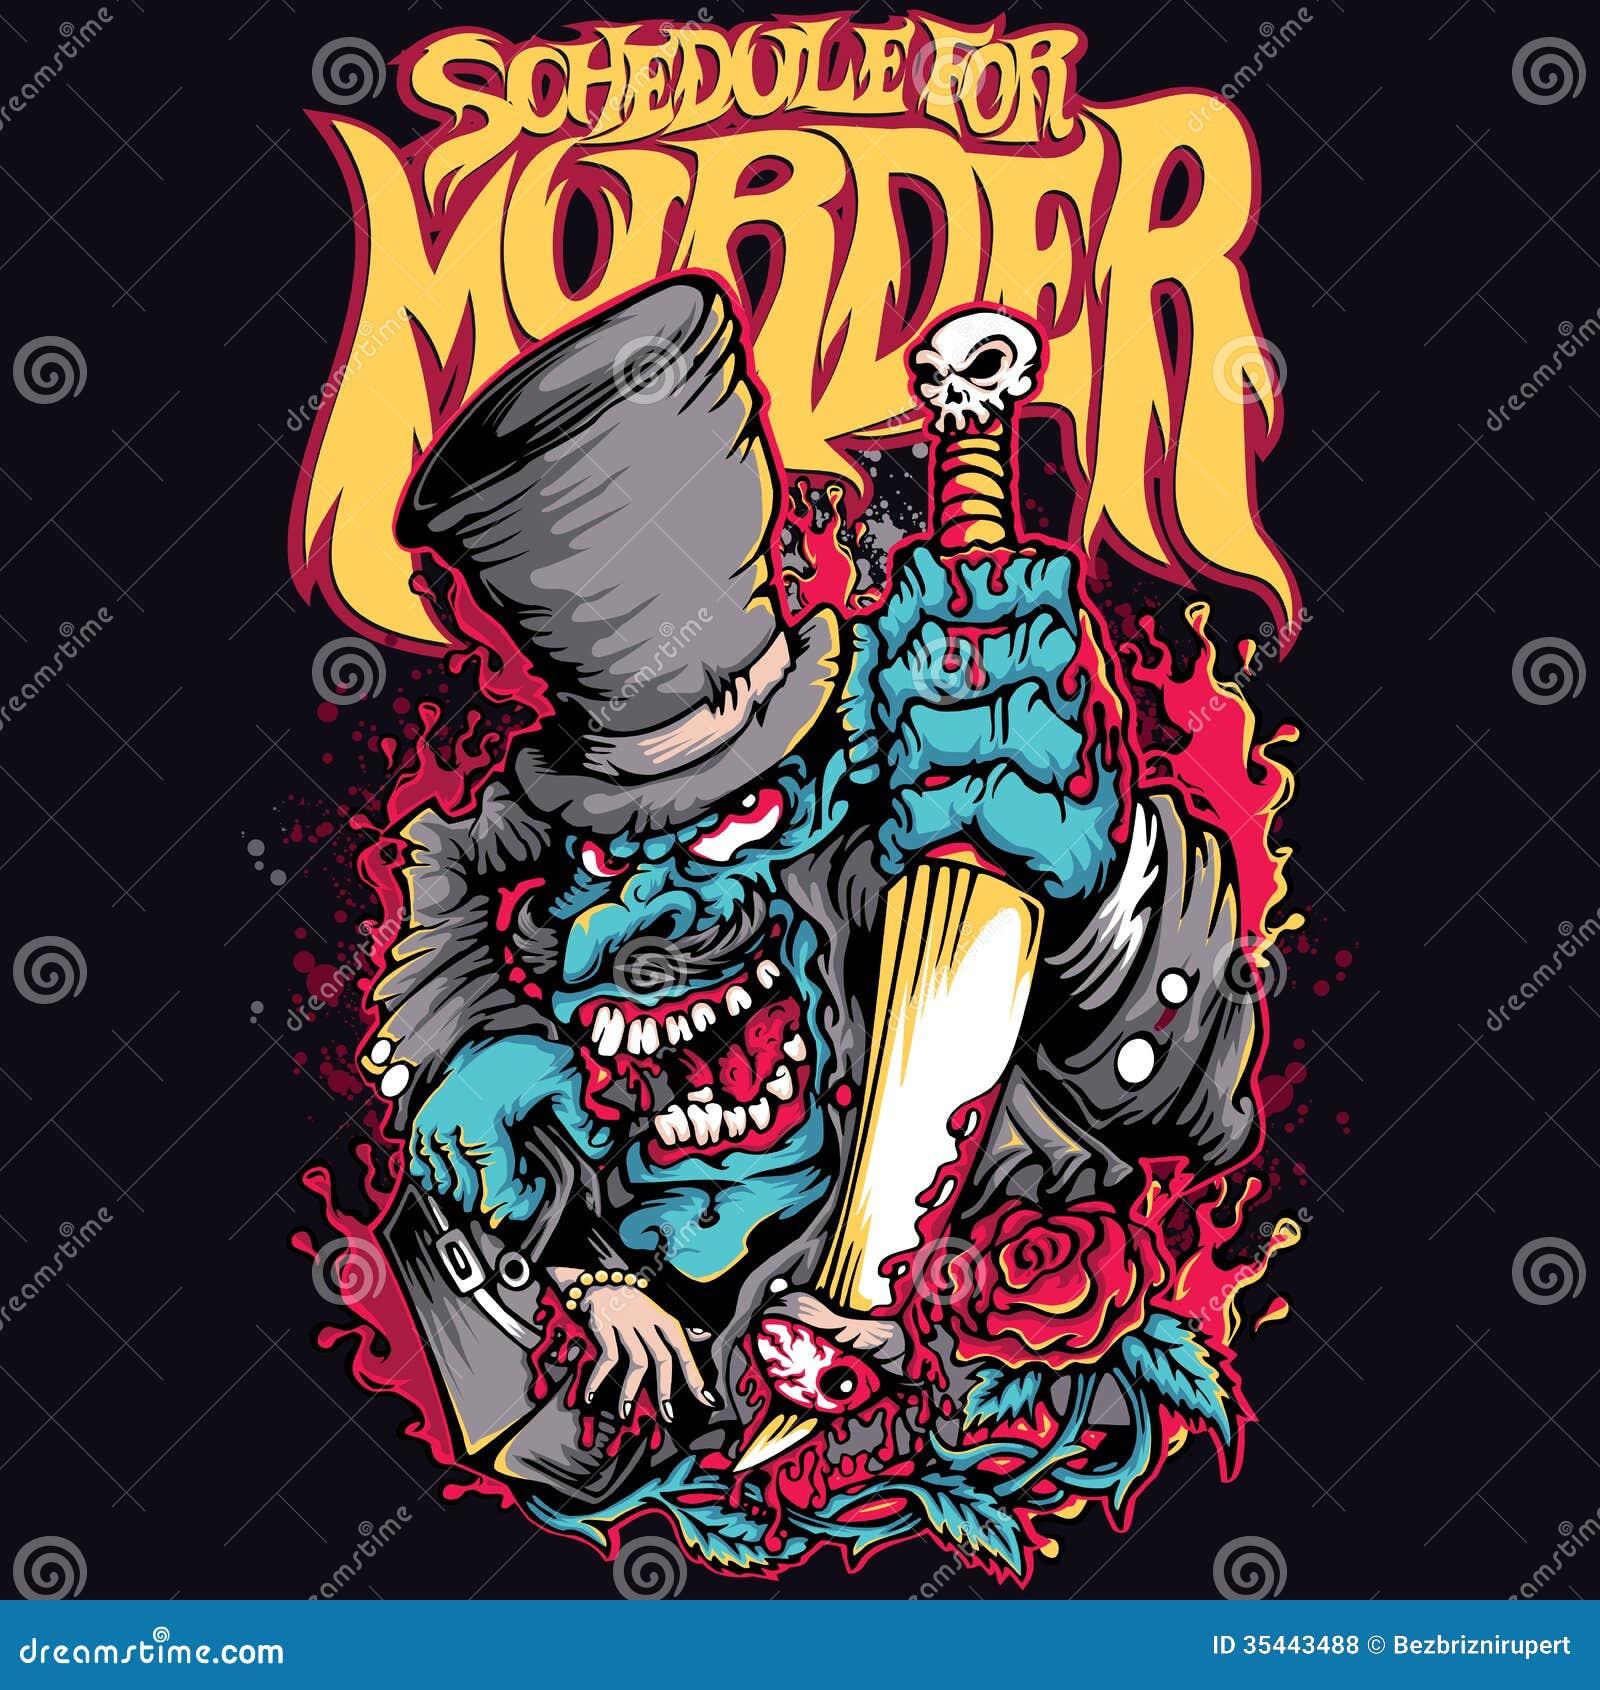 Free poster design and print - Killer